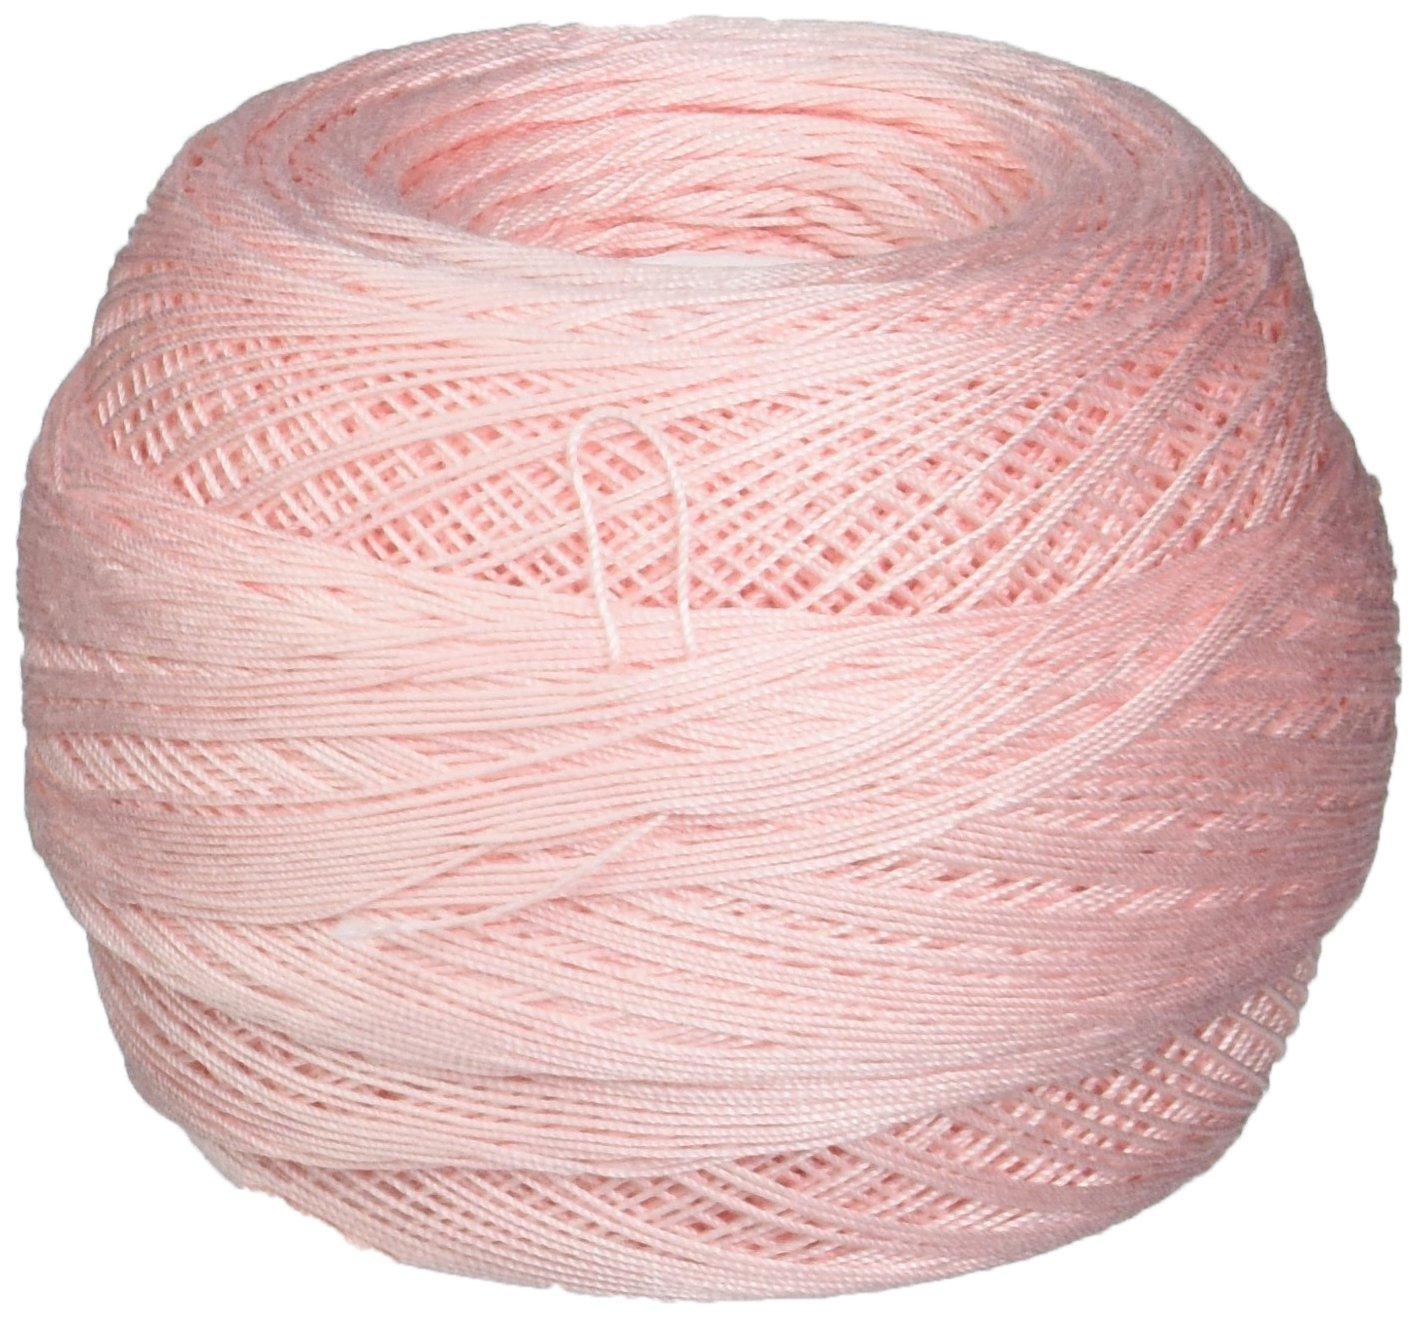 DMC Cebelia かぎ針編みコットン 毛糸 ベビーピンク サイズ 30 約514m B004SVJMXS